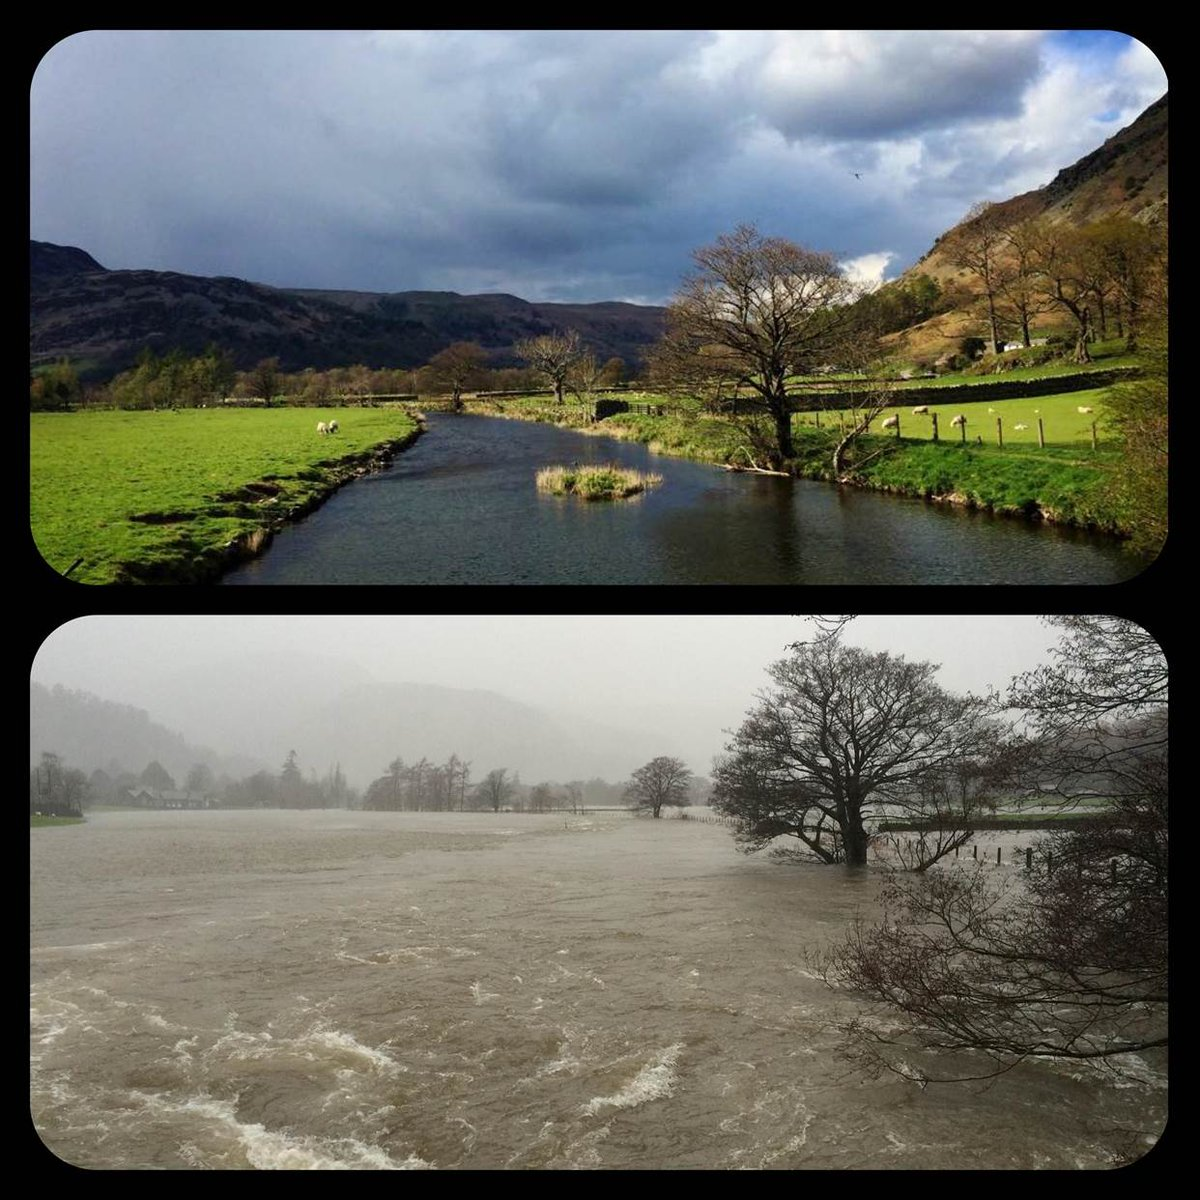 cumbria flood bride battles - 600×600